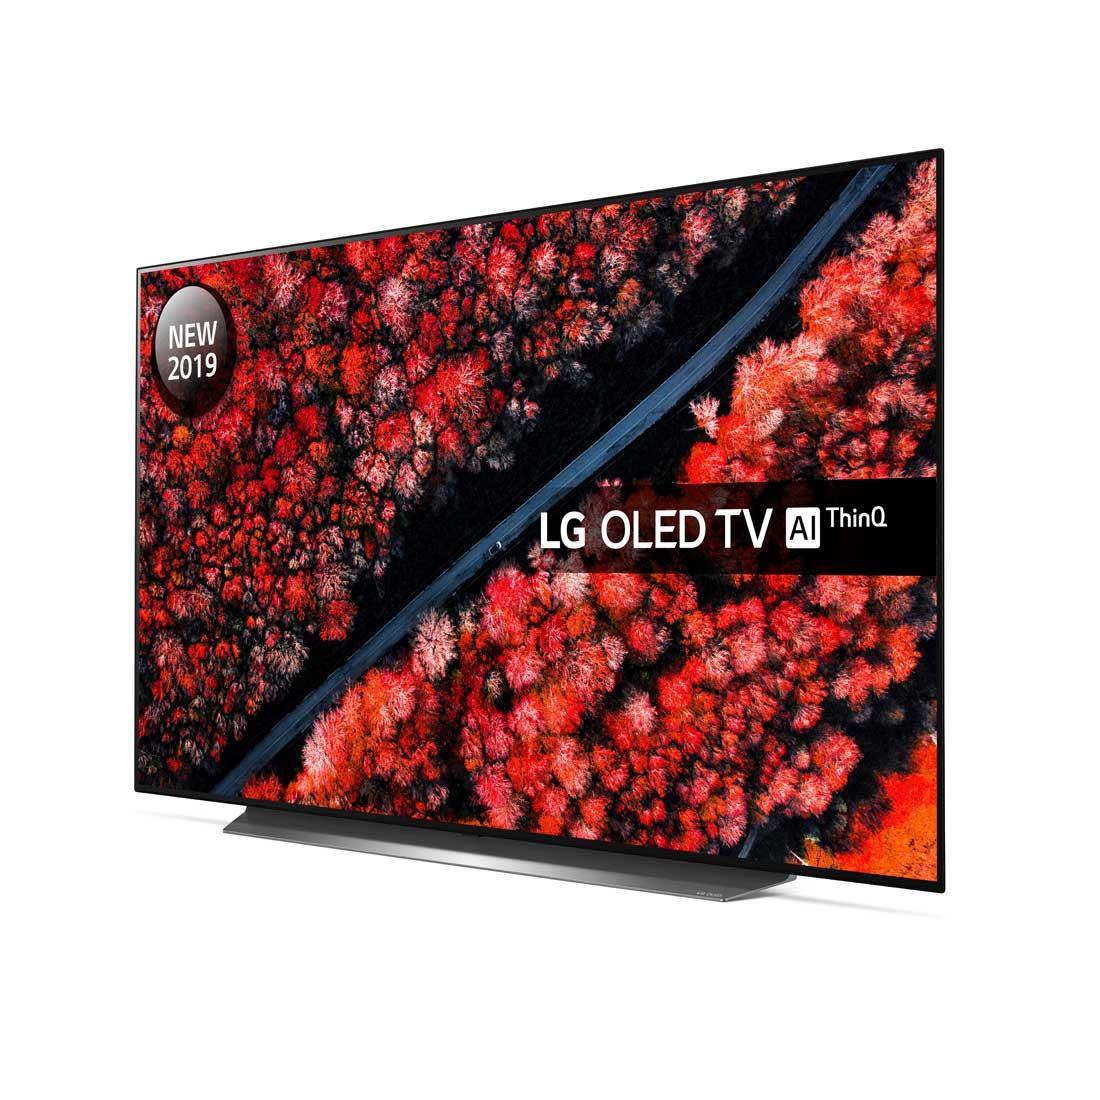 LG OLED55C9PLA 55 inch 4k television £1299 with Voucher @ Sevenoaks Sound